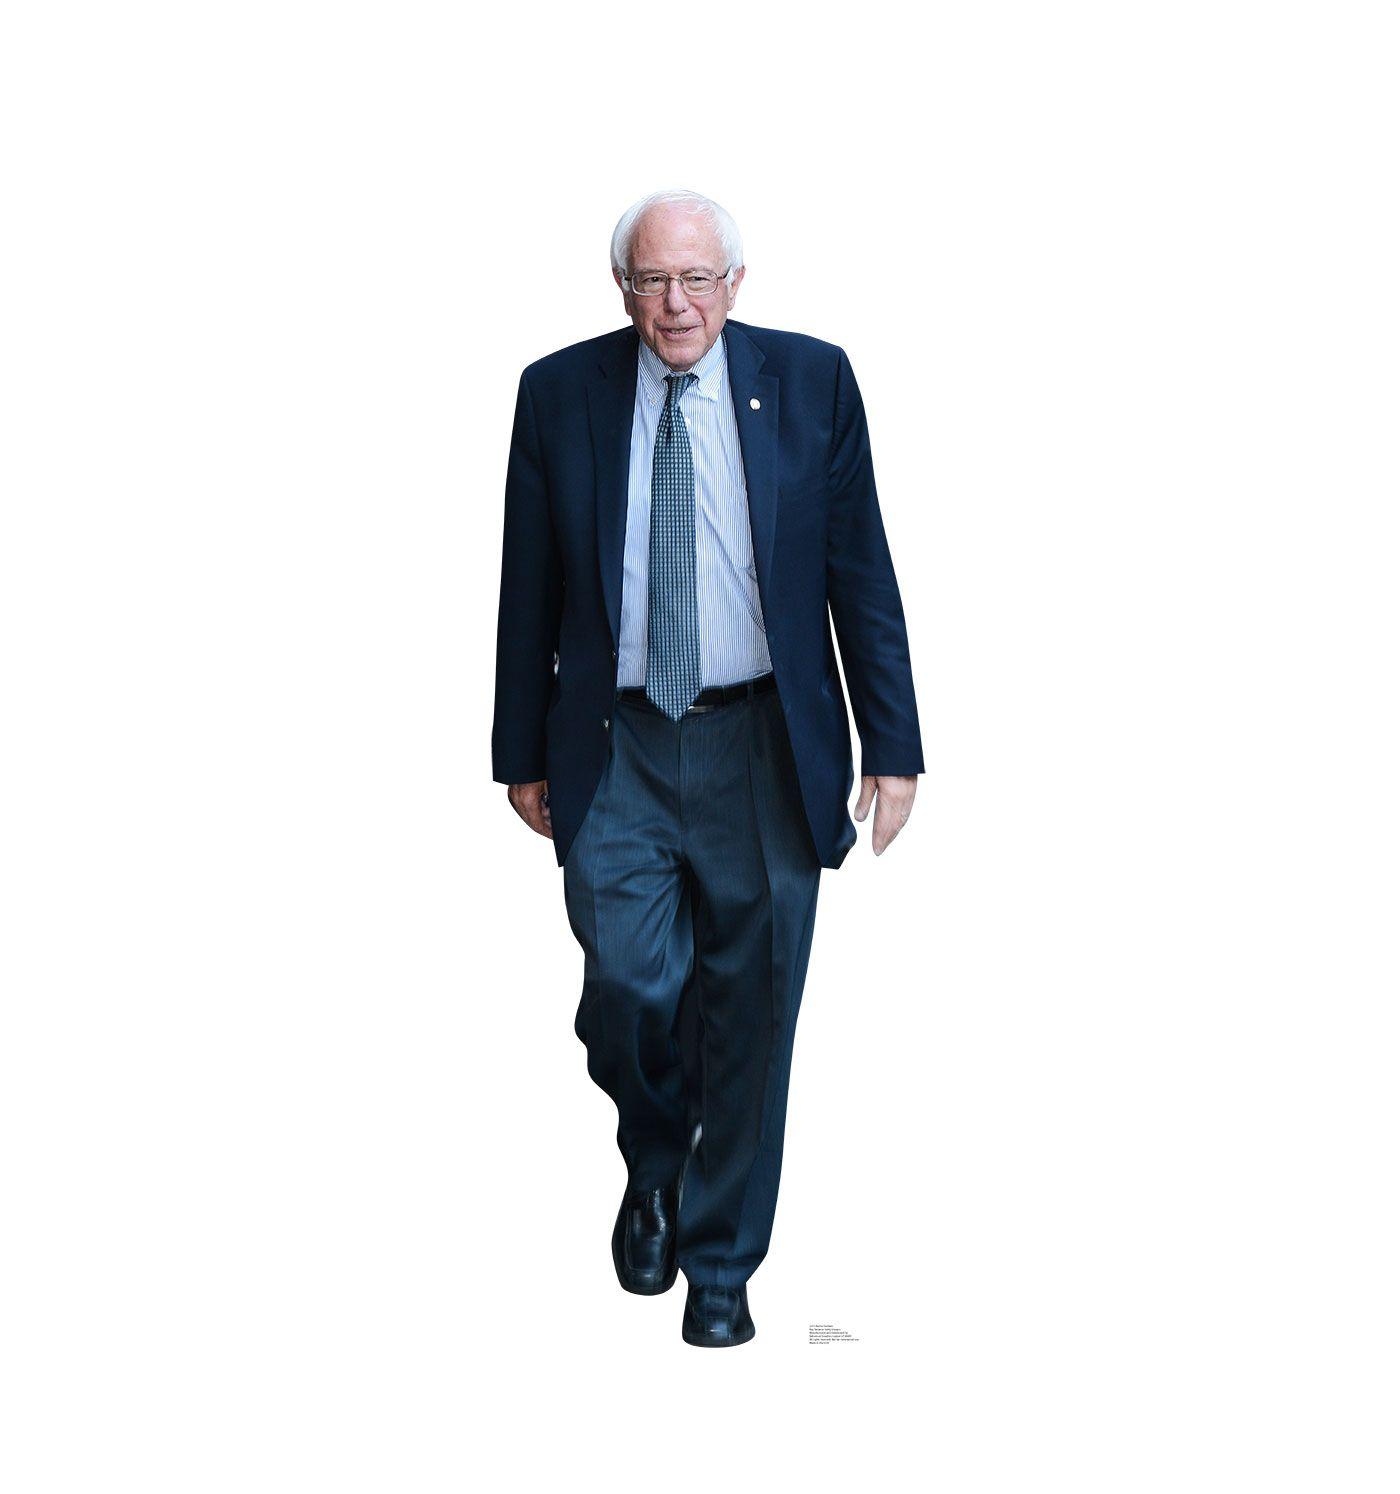 Bernie sanders cardboard cutout 2215 life size